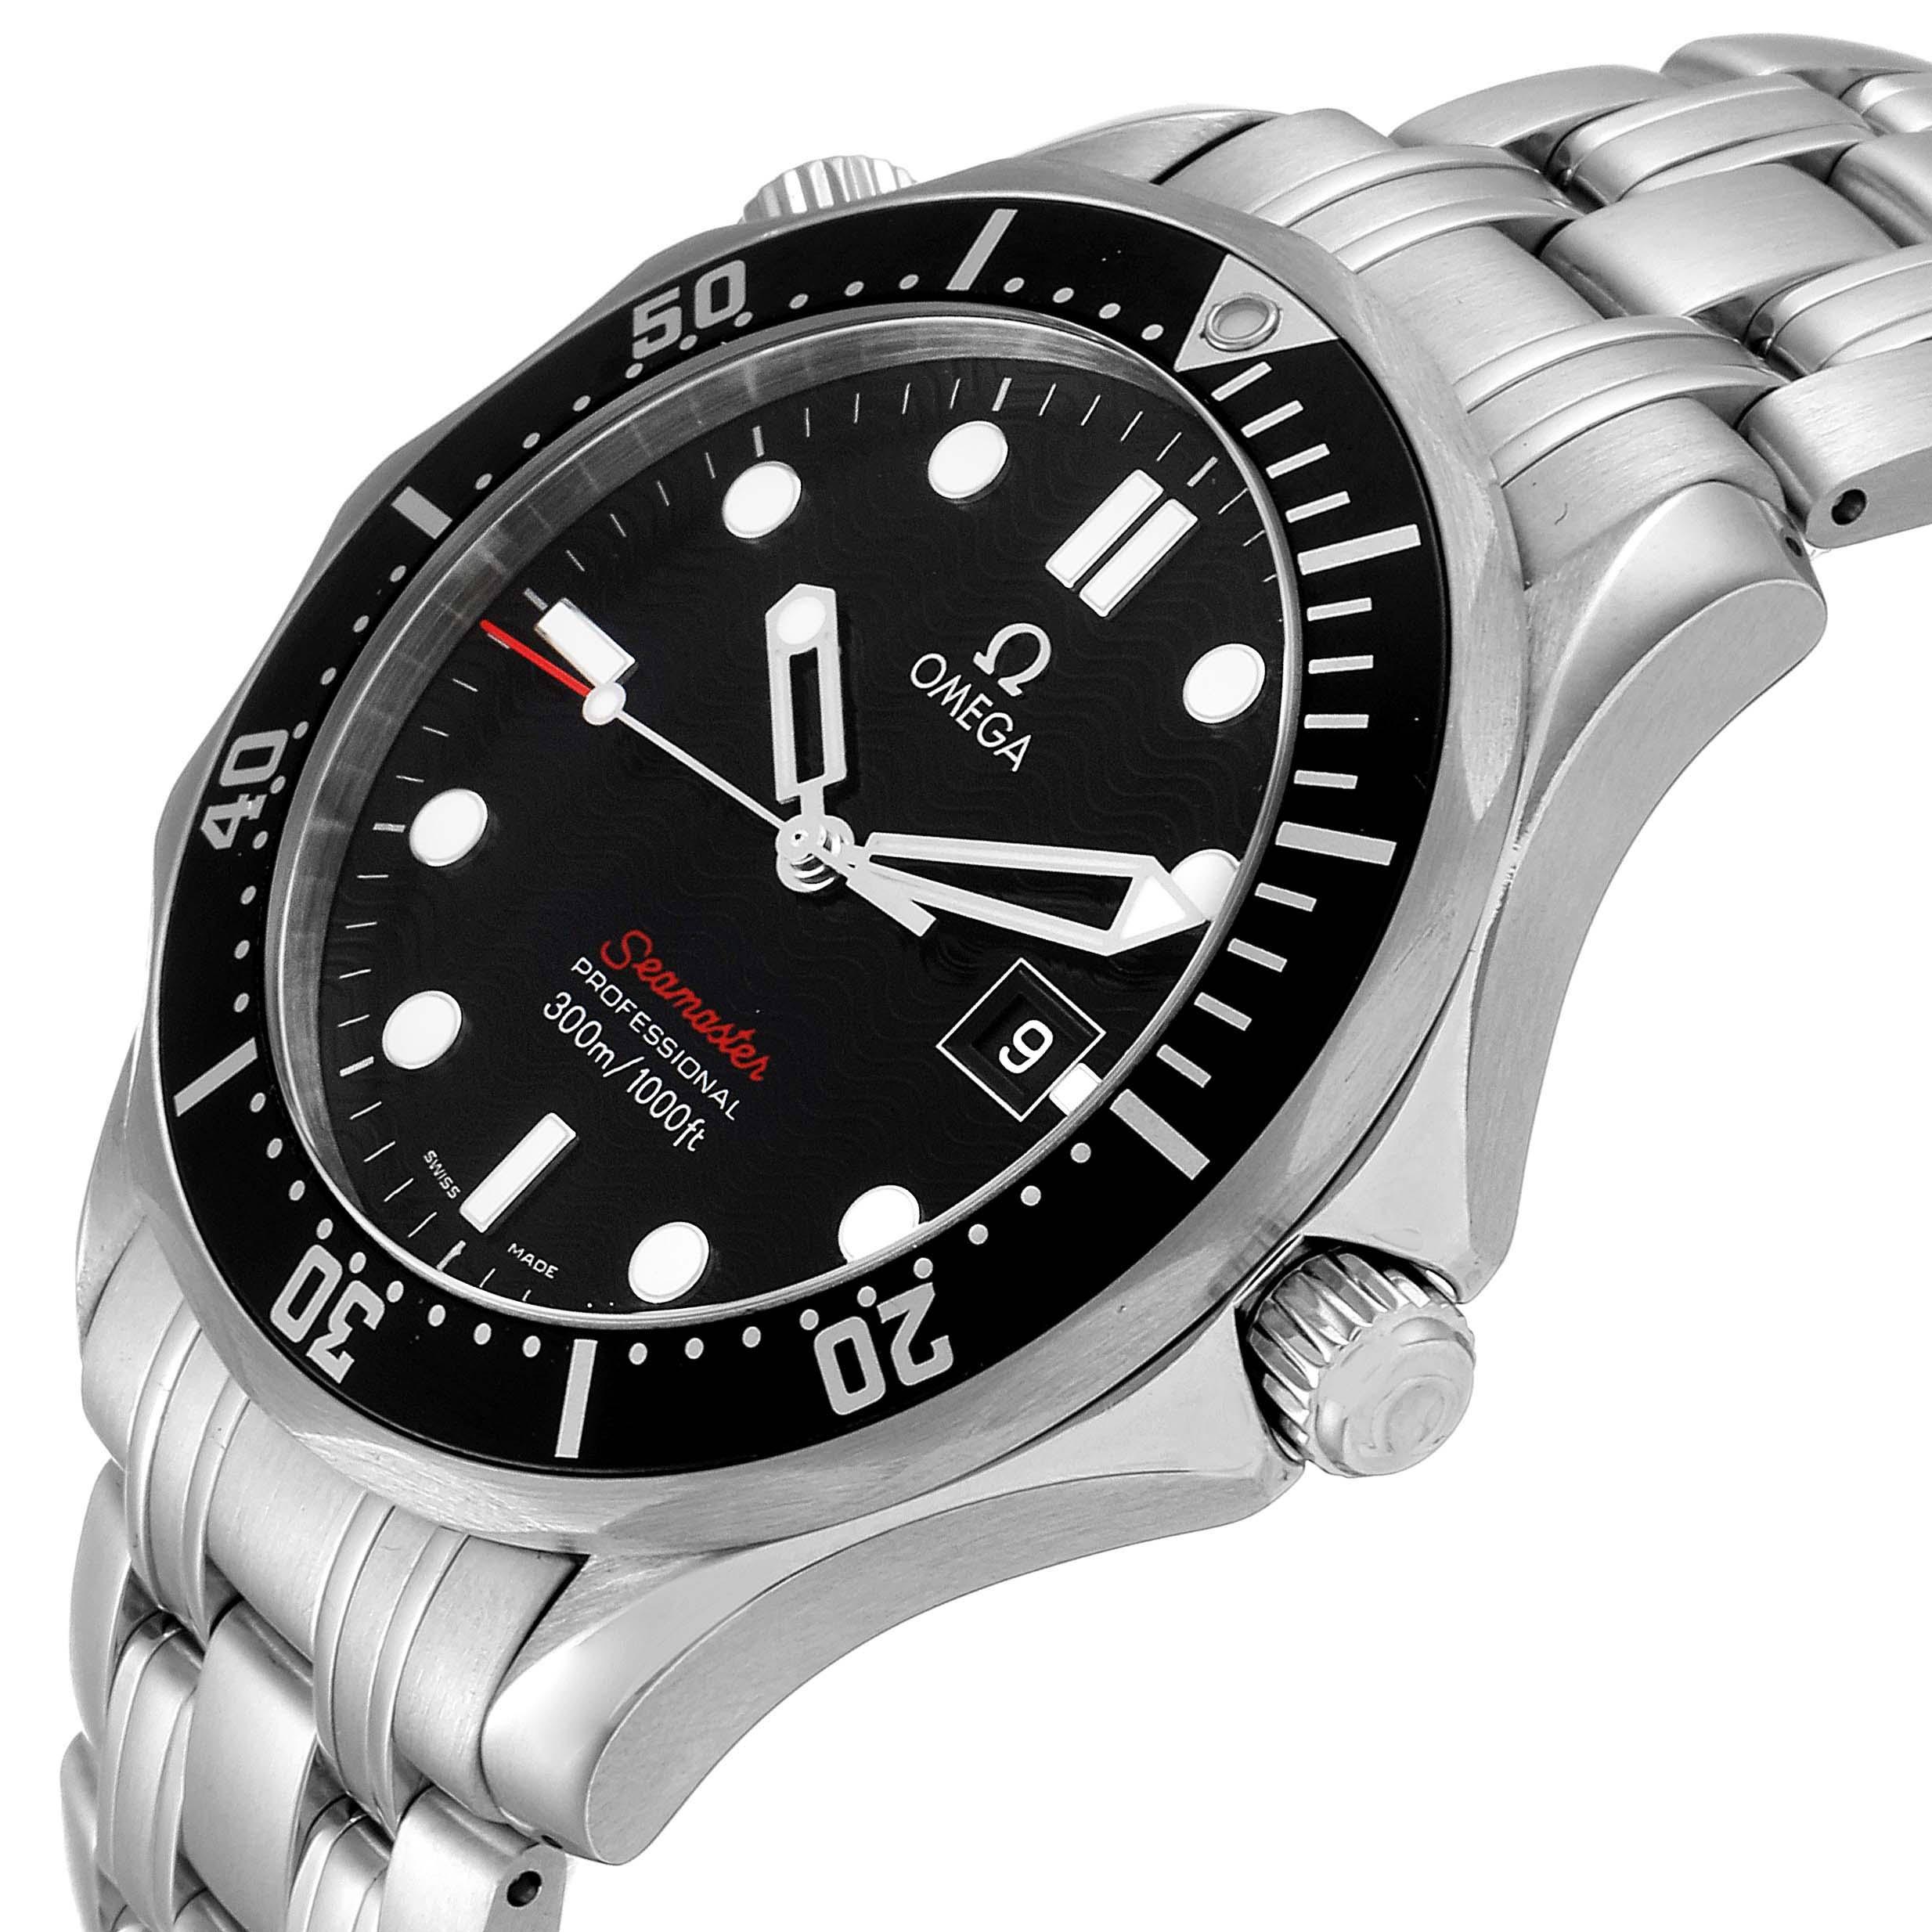 Omega Seamaster 300M Black Dial Steel Mens Watch 212.30.41.61.01.001 SwissWatchExpo